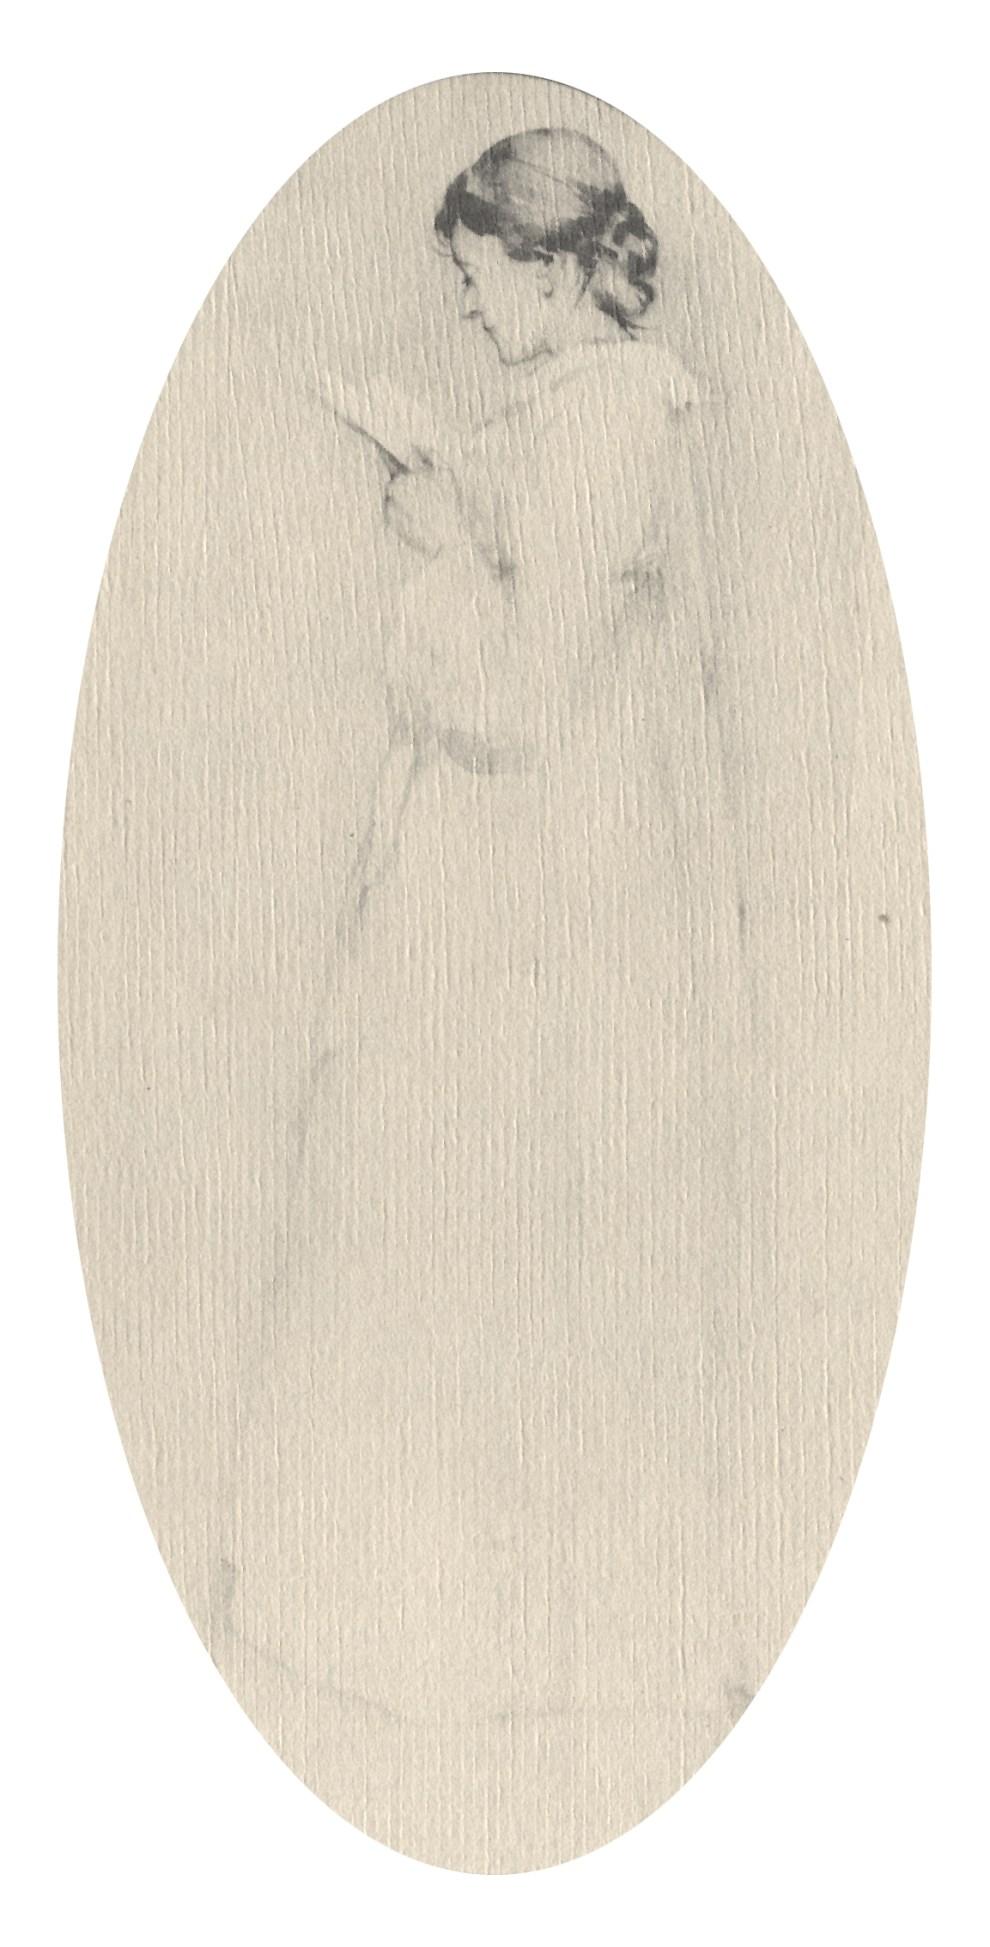 Emil Carlsen Woman in White, Reading, 1894